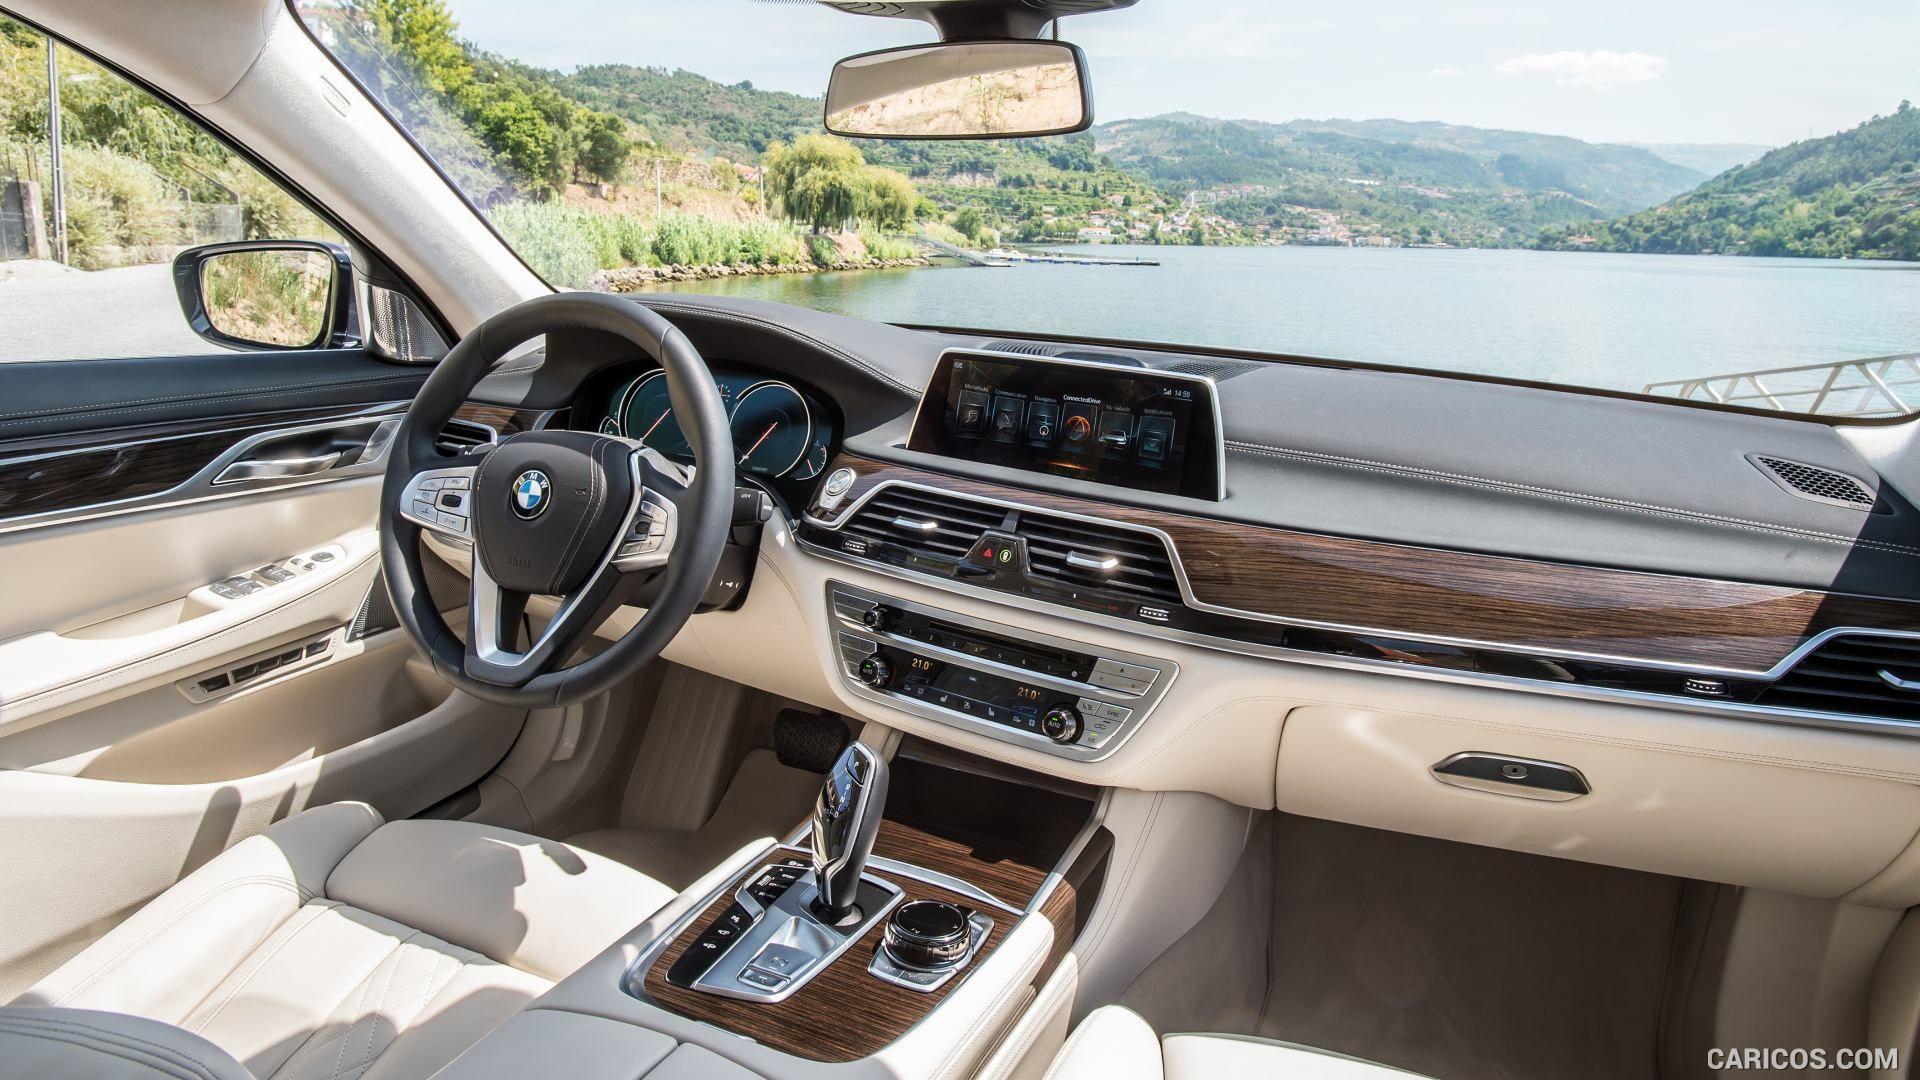 2016 Bmw 7 Series 730d Interior Dashboard Hd Wallpaper 236